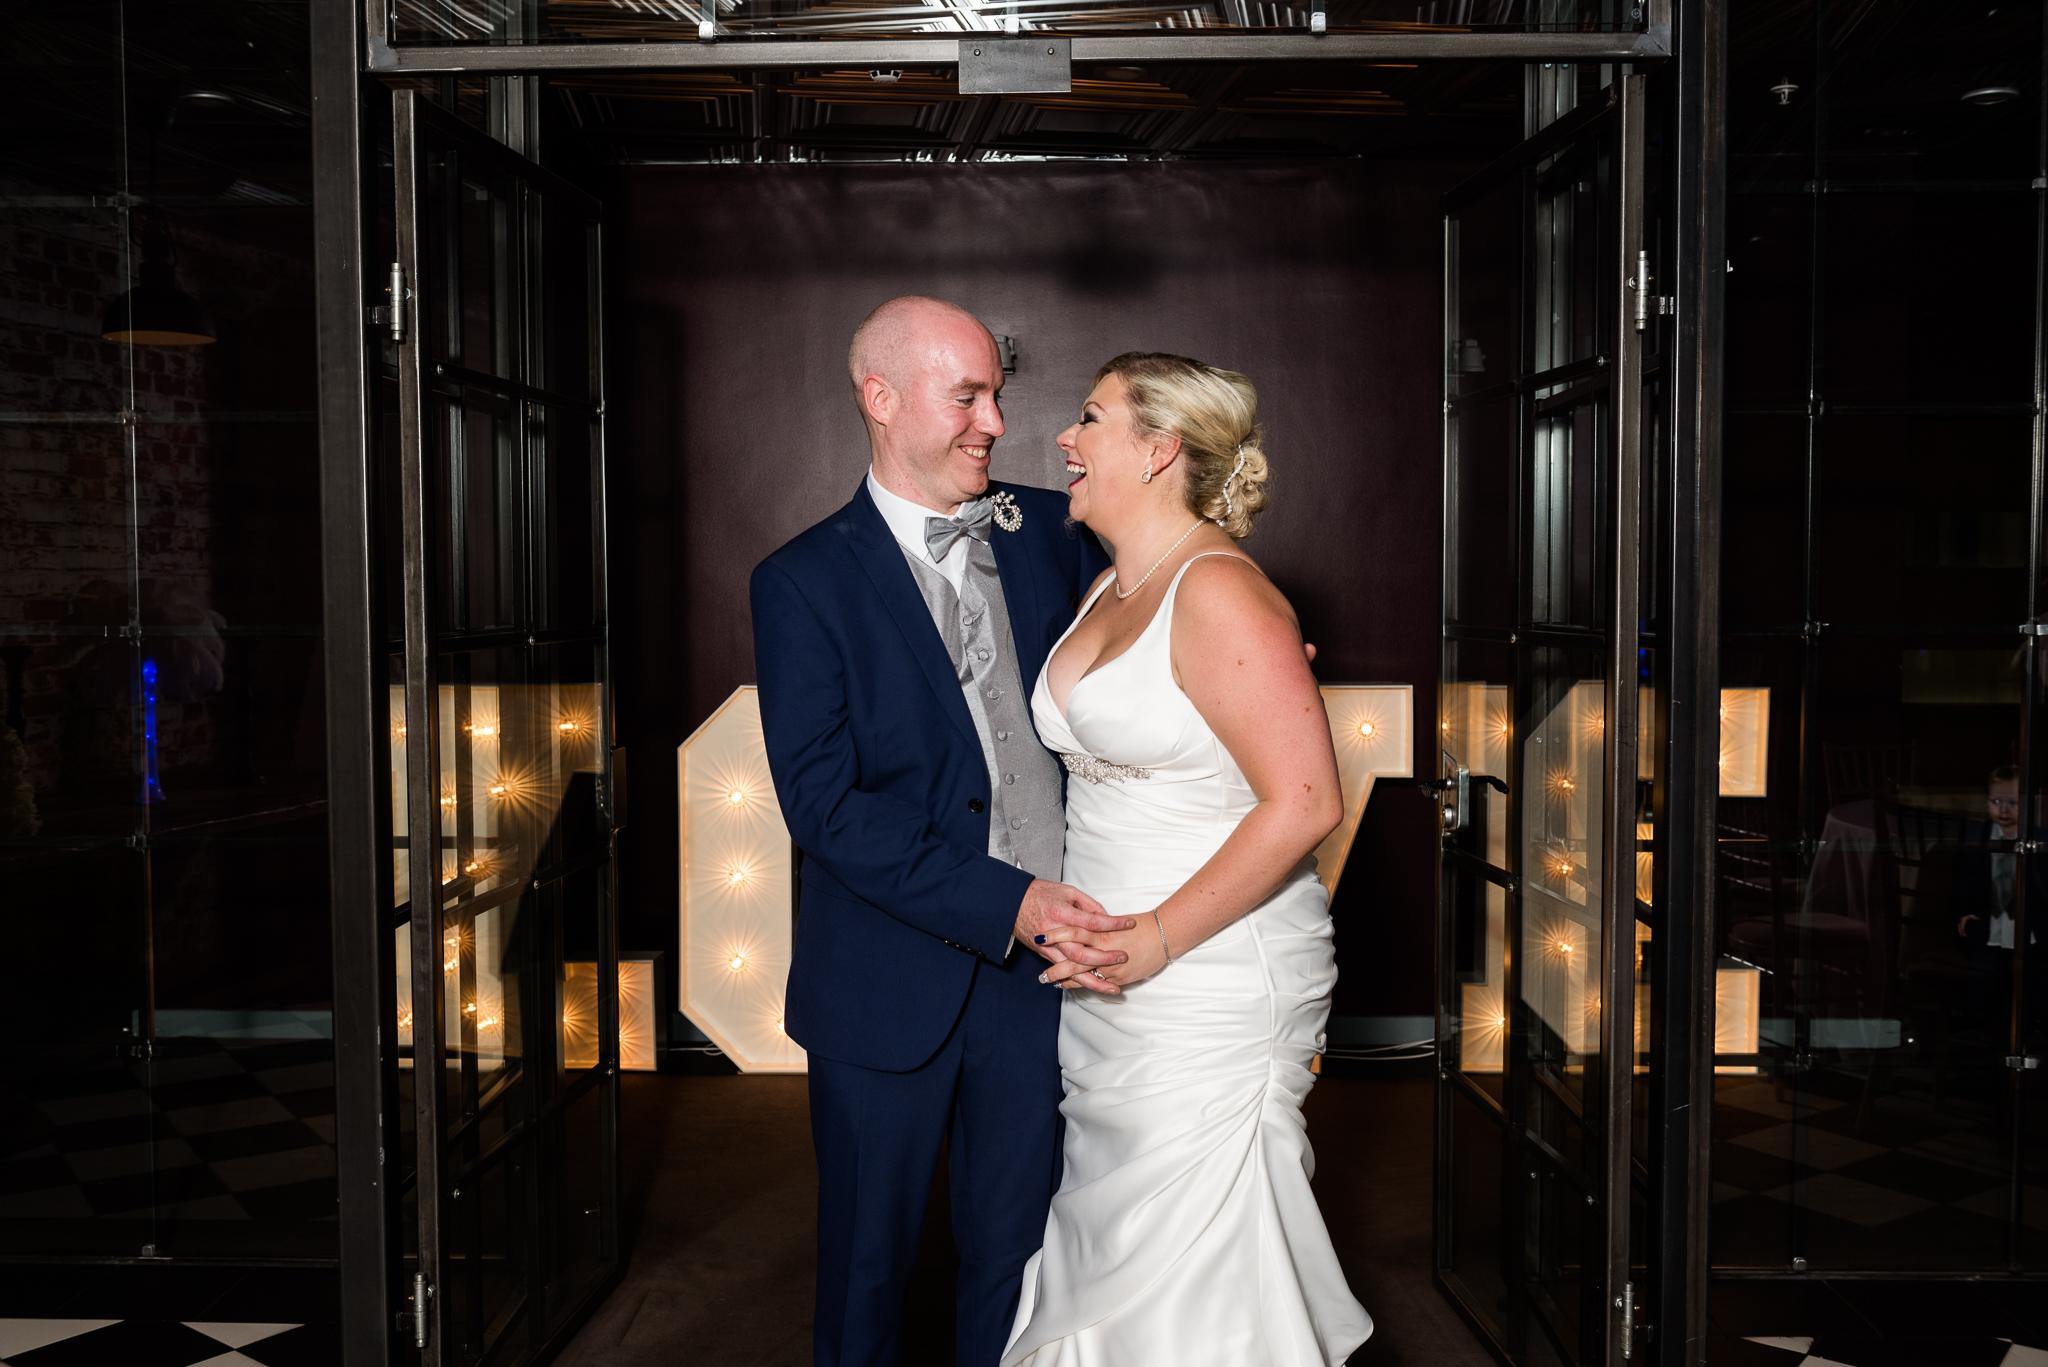 Manchester Wedding Photography On the 7th Media City UK, Salford 20s Art Deco Feathers Urban - Jenny Harper-27.jpg